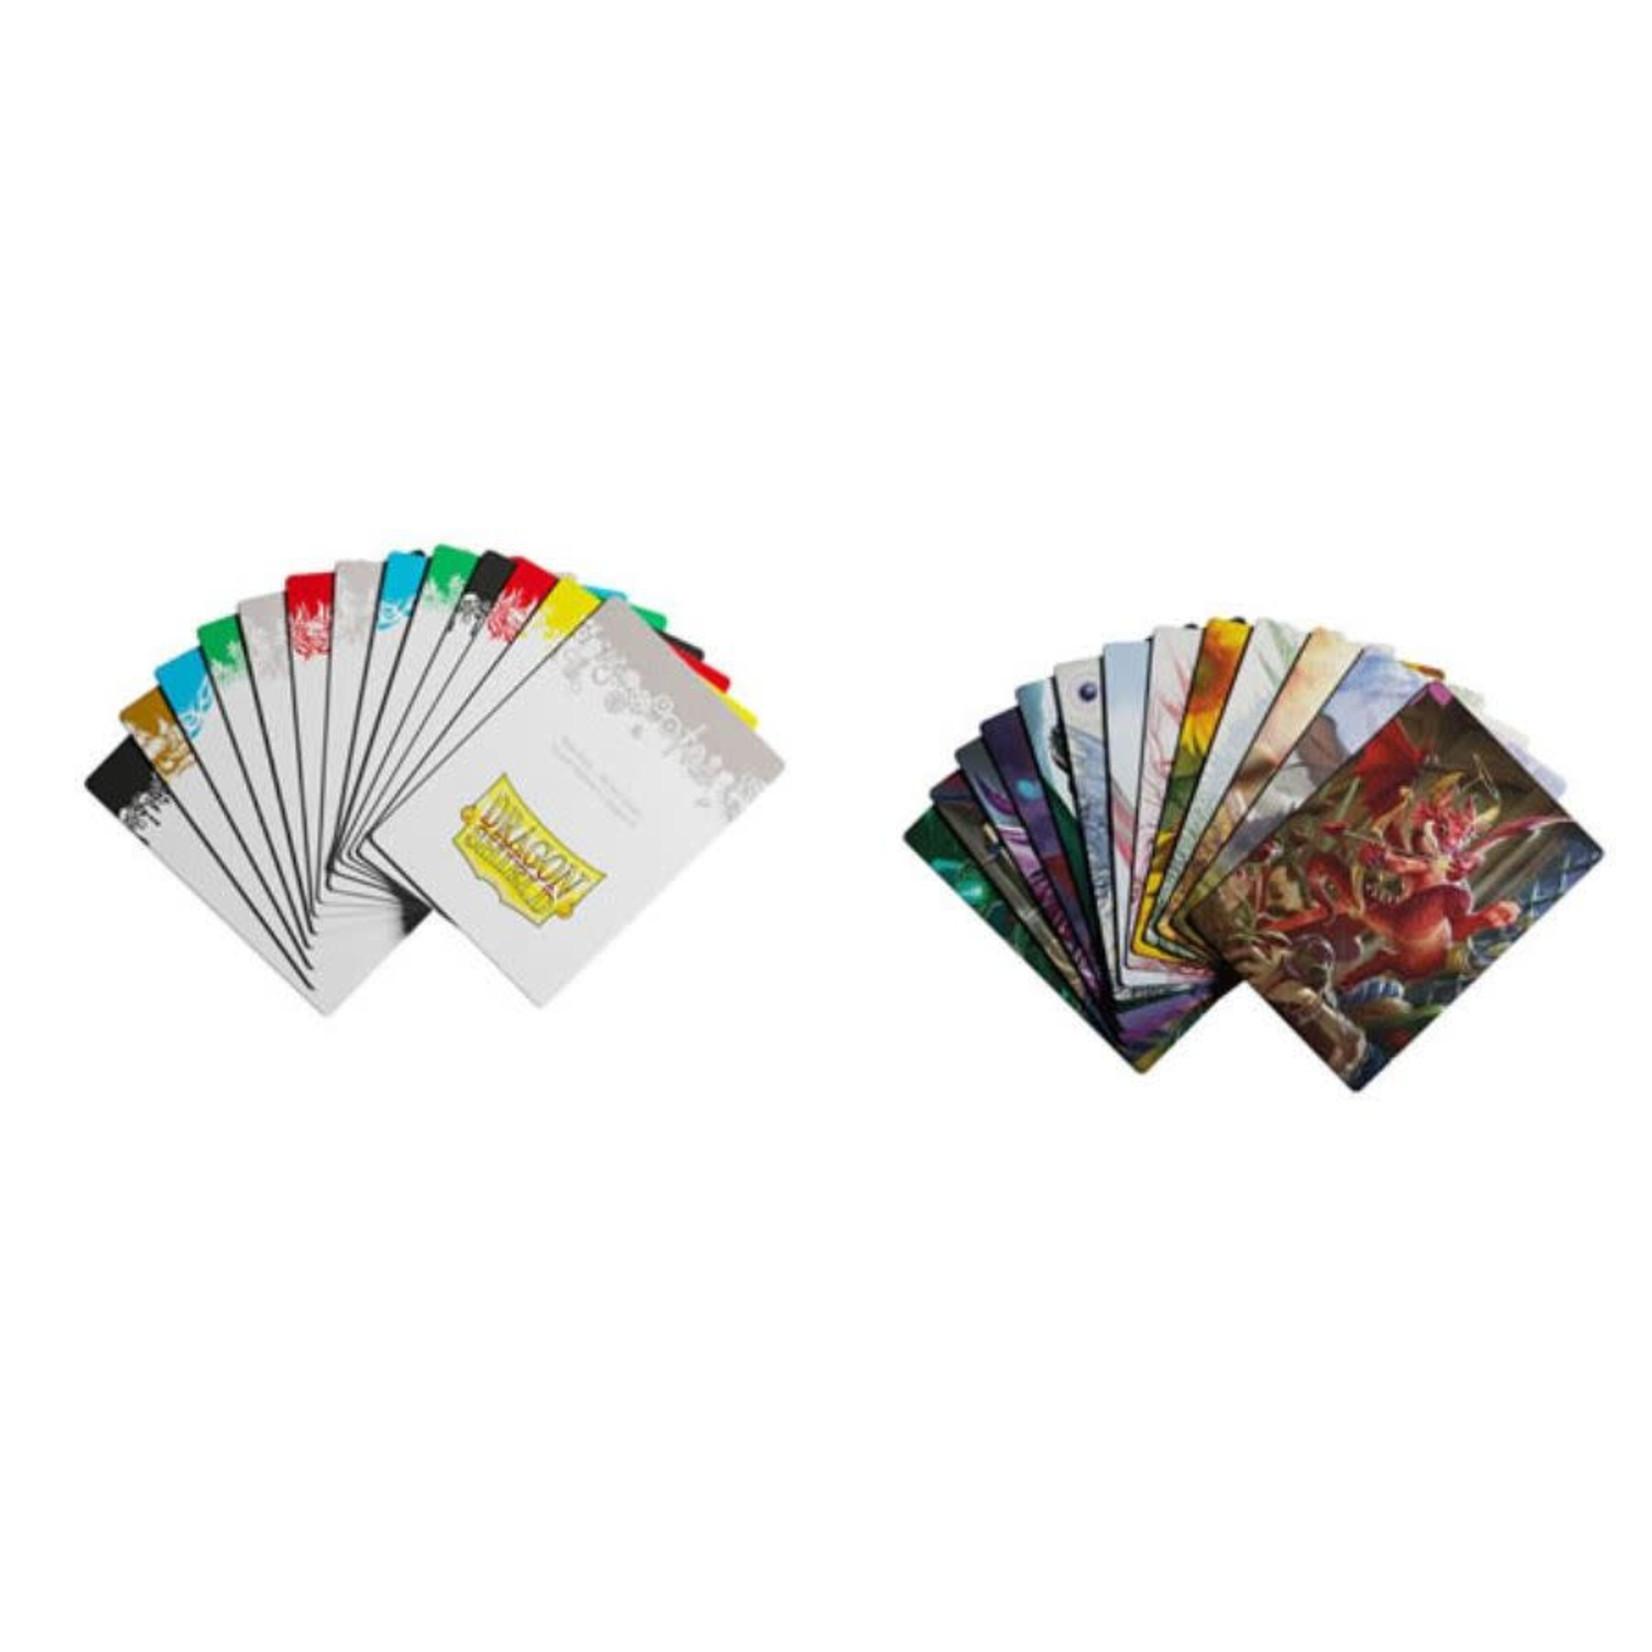 Arcane Tinman Dragon Shield: Card Dividers - Series 1 Booster